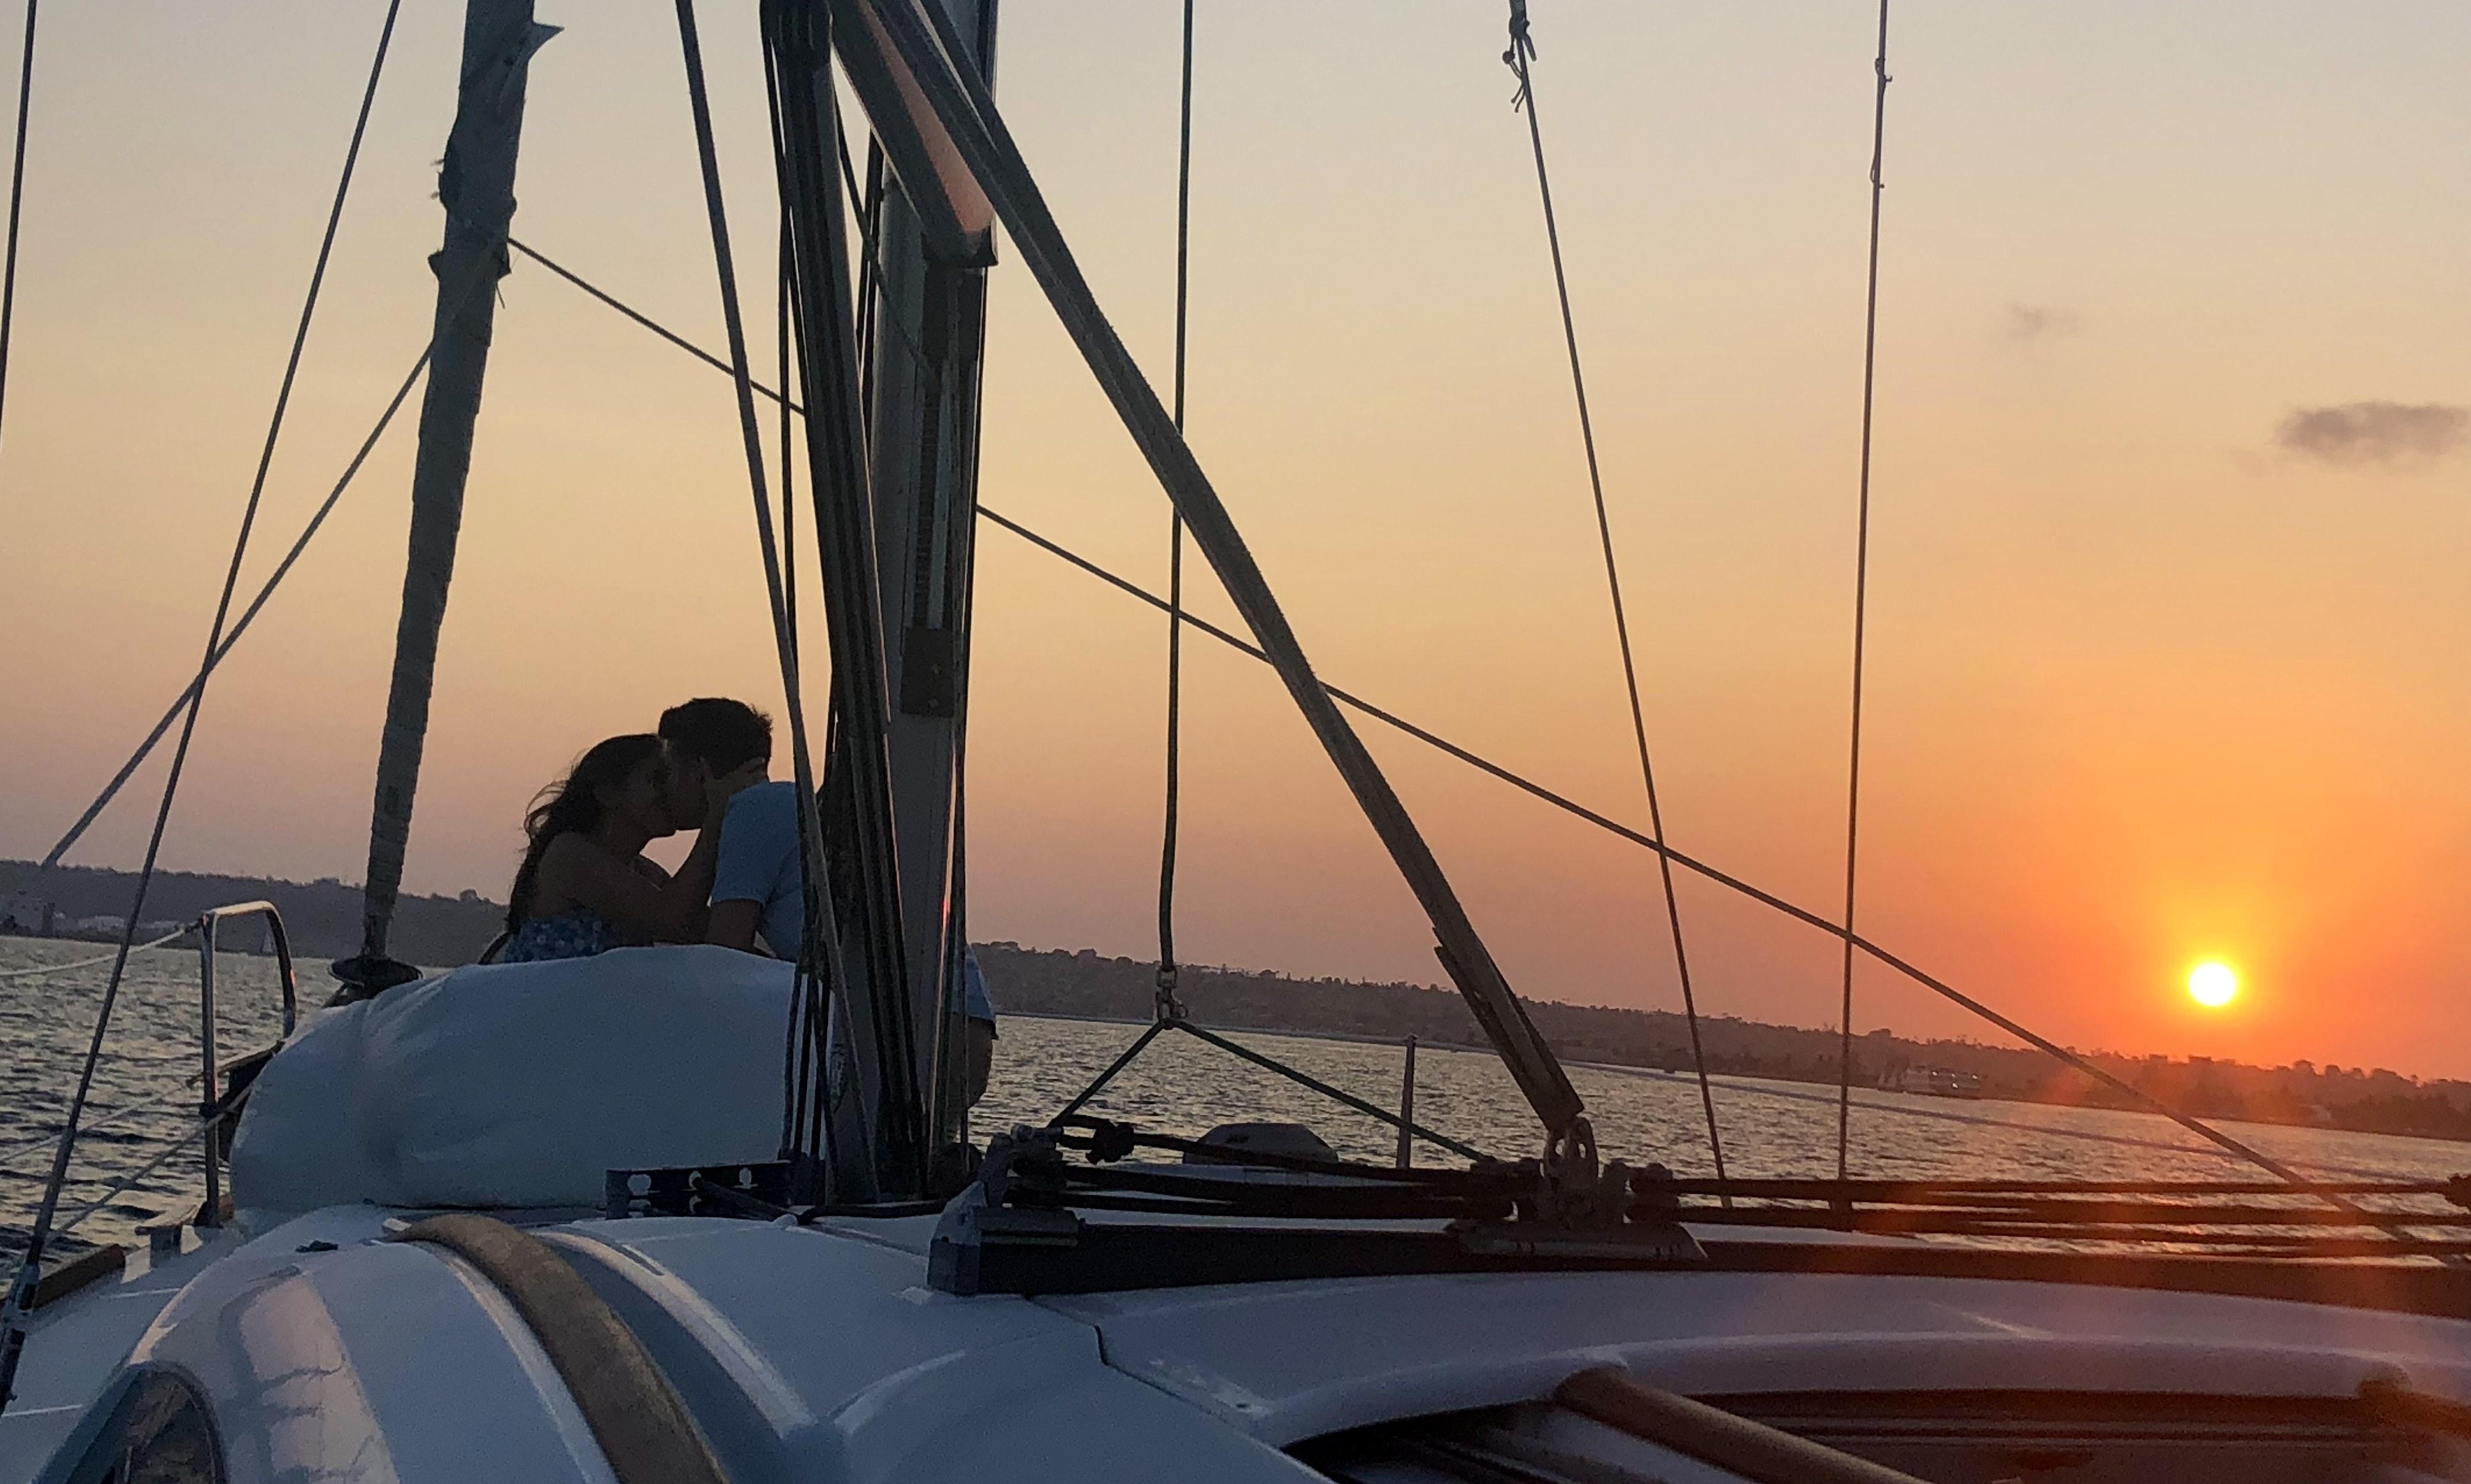 Sunset Sail Aboard A Beneteau Oceanis 40 Sailing Yacht Getmyboat